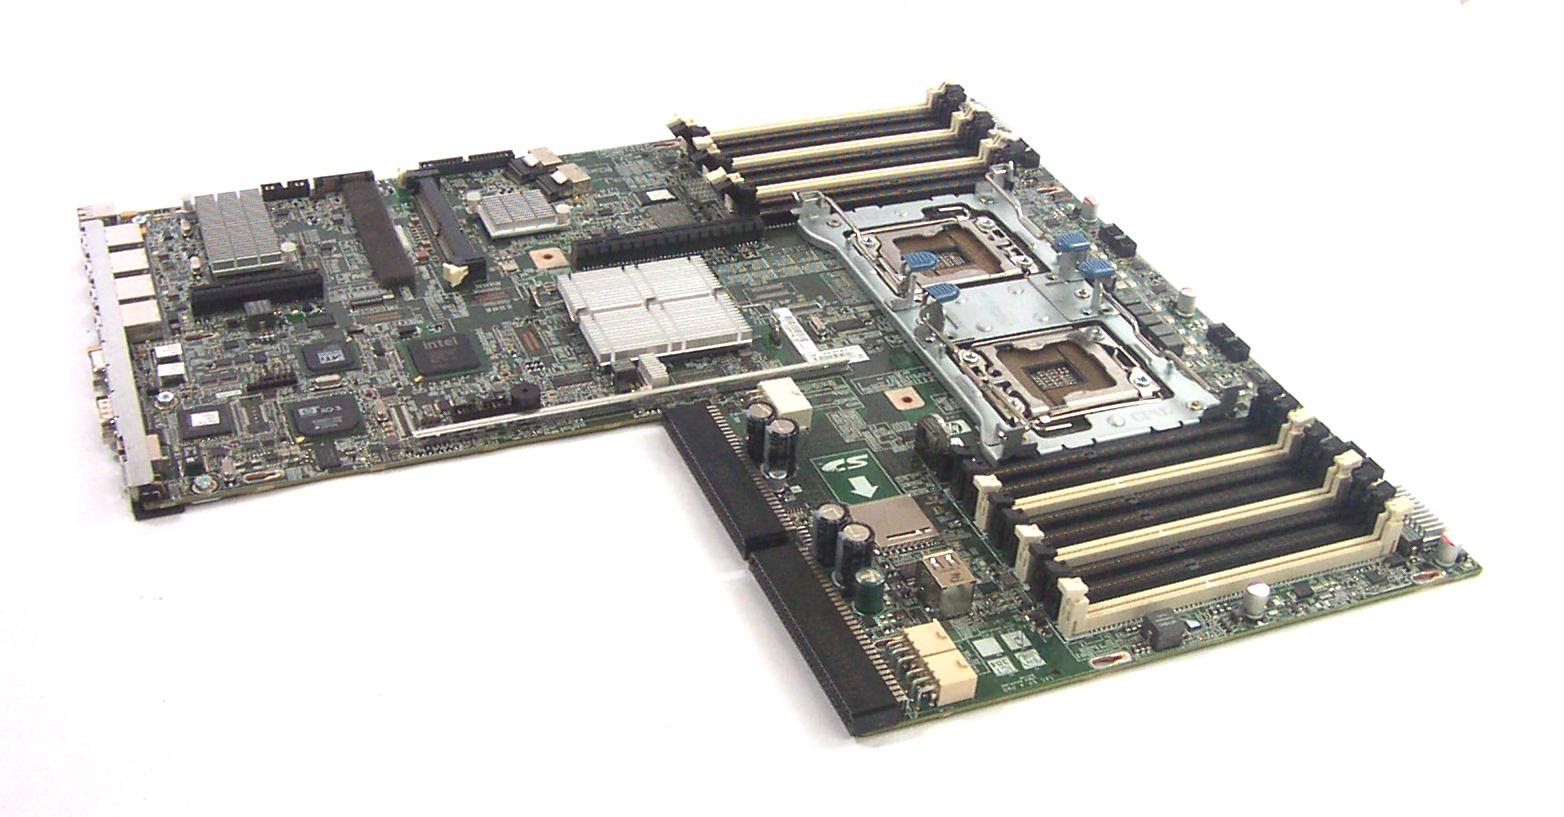 HP 602512-001 Proliant DL360 G7 Dual Socket System Board - 591545-001